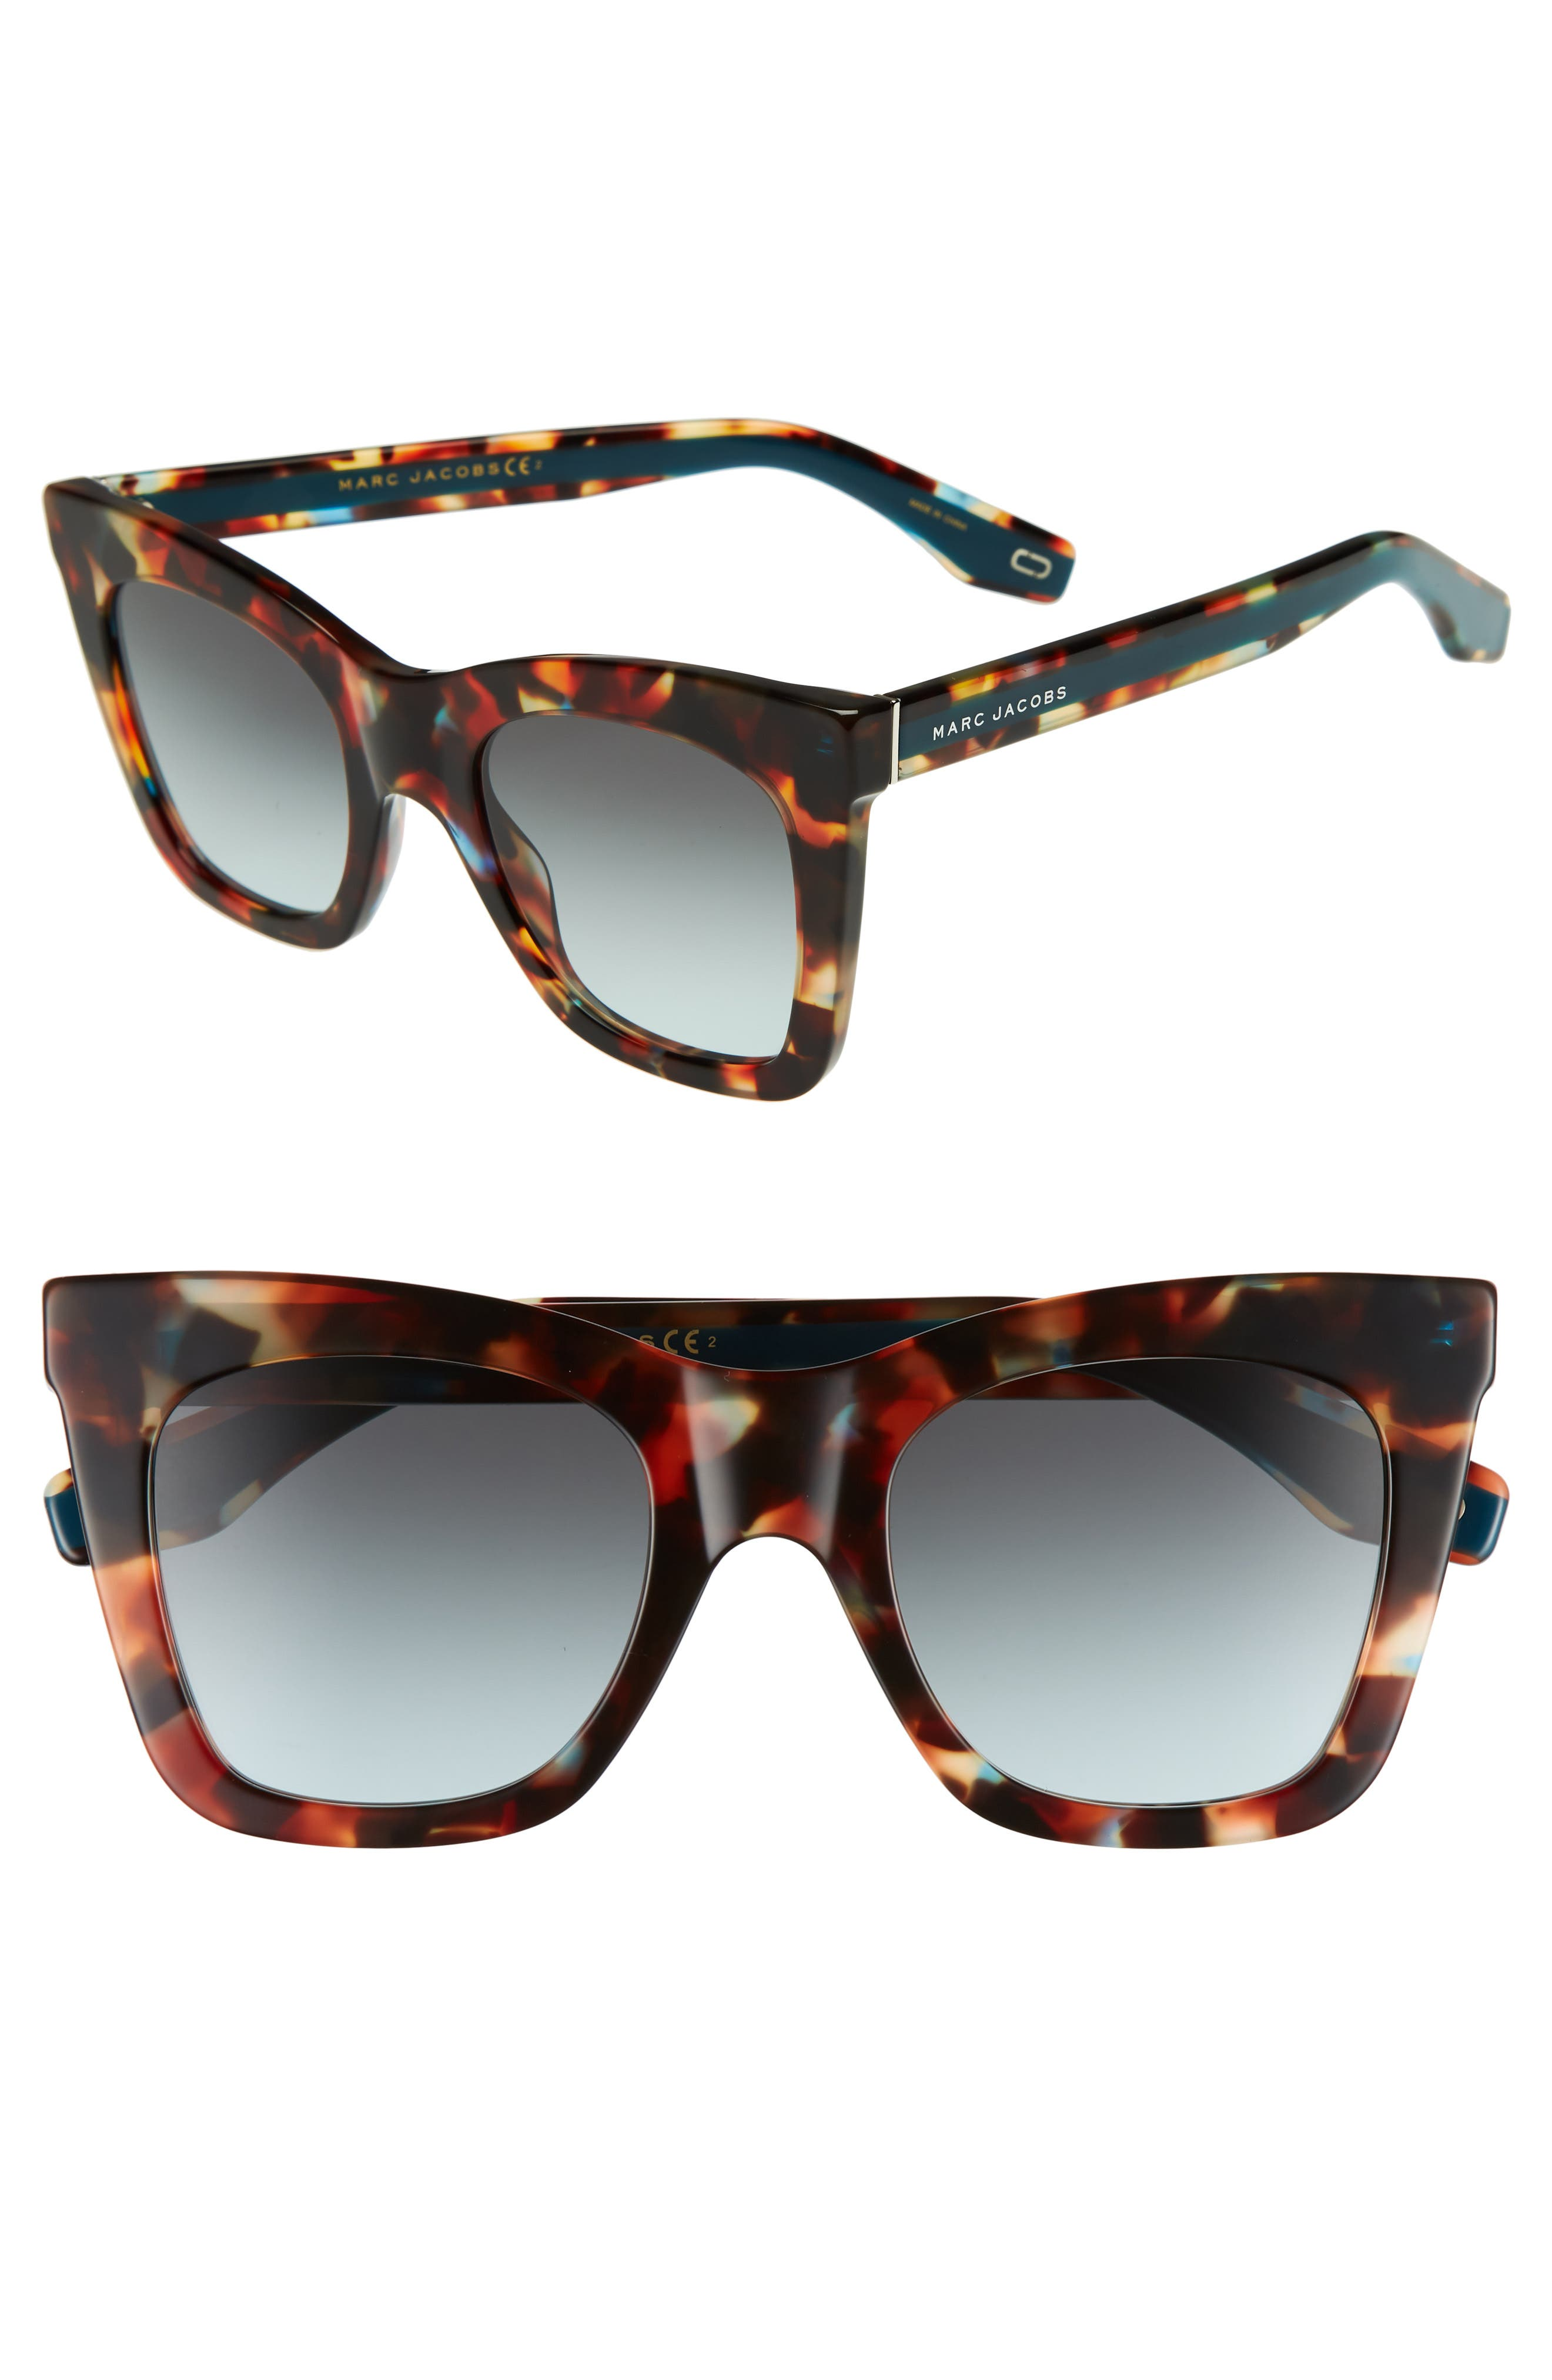 50mm Cat Eye Sunglasses,                         Main,                         color, Havnturqu